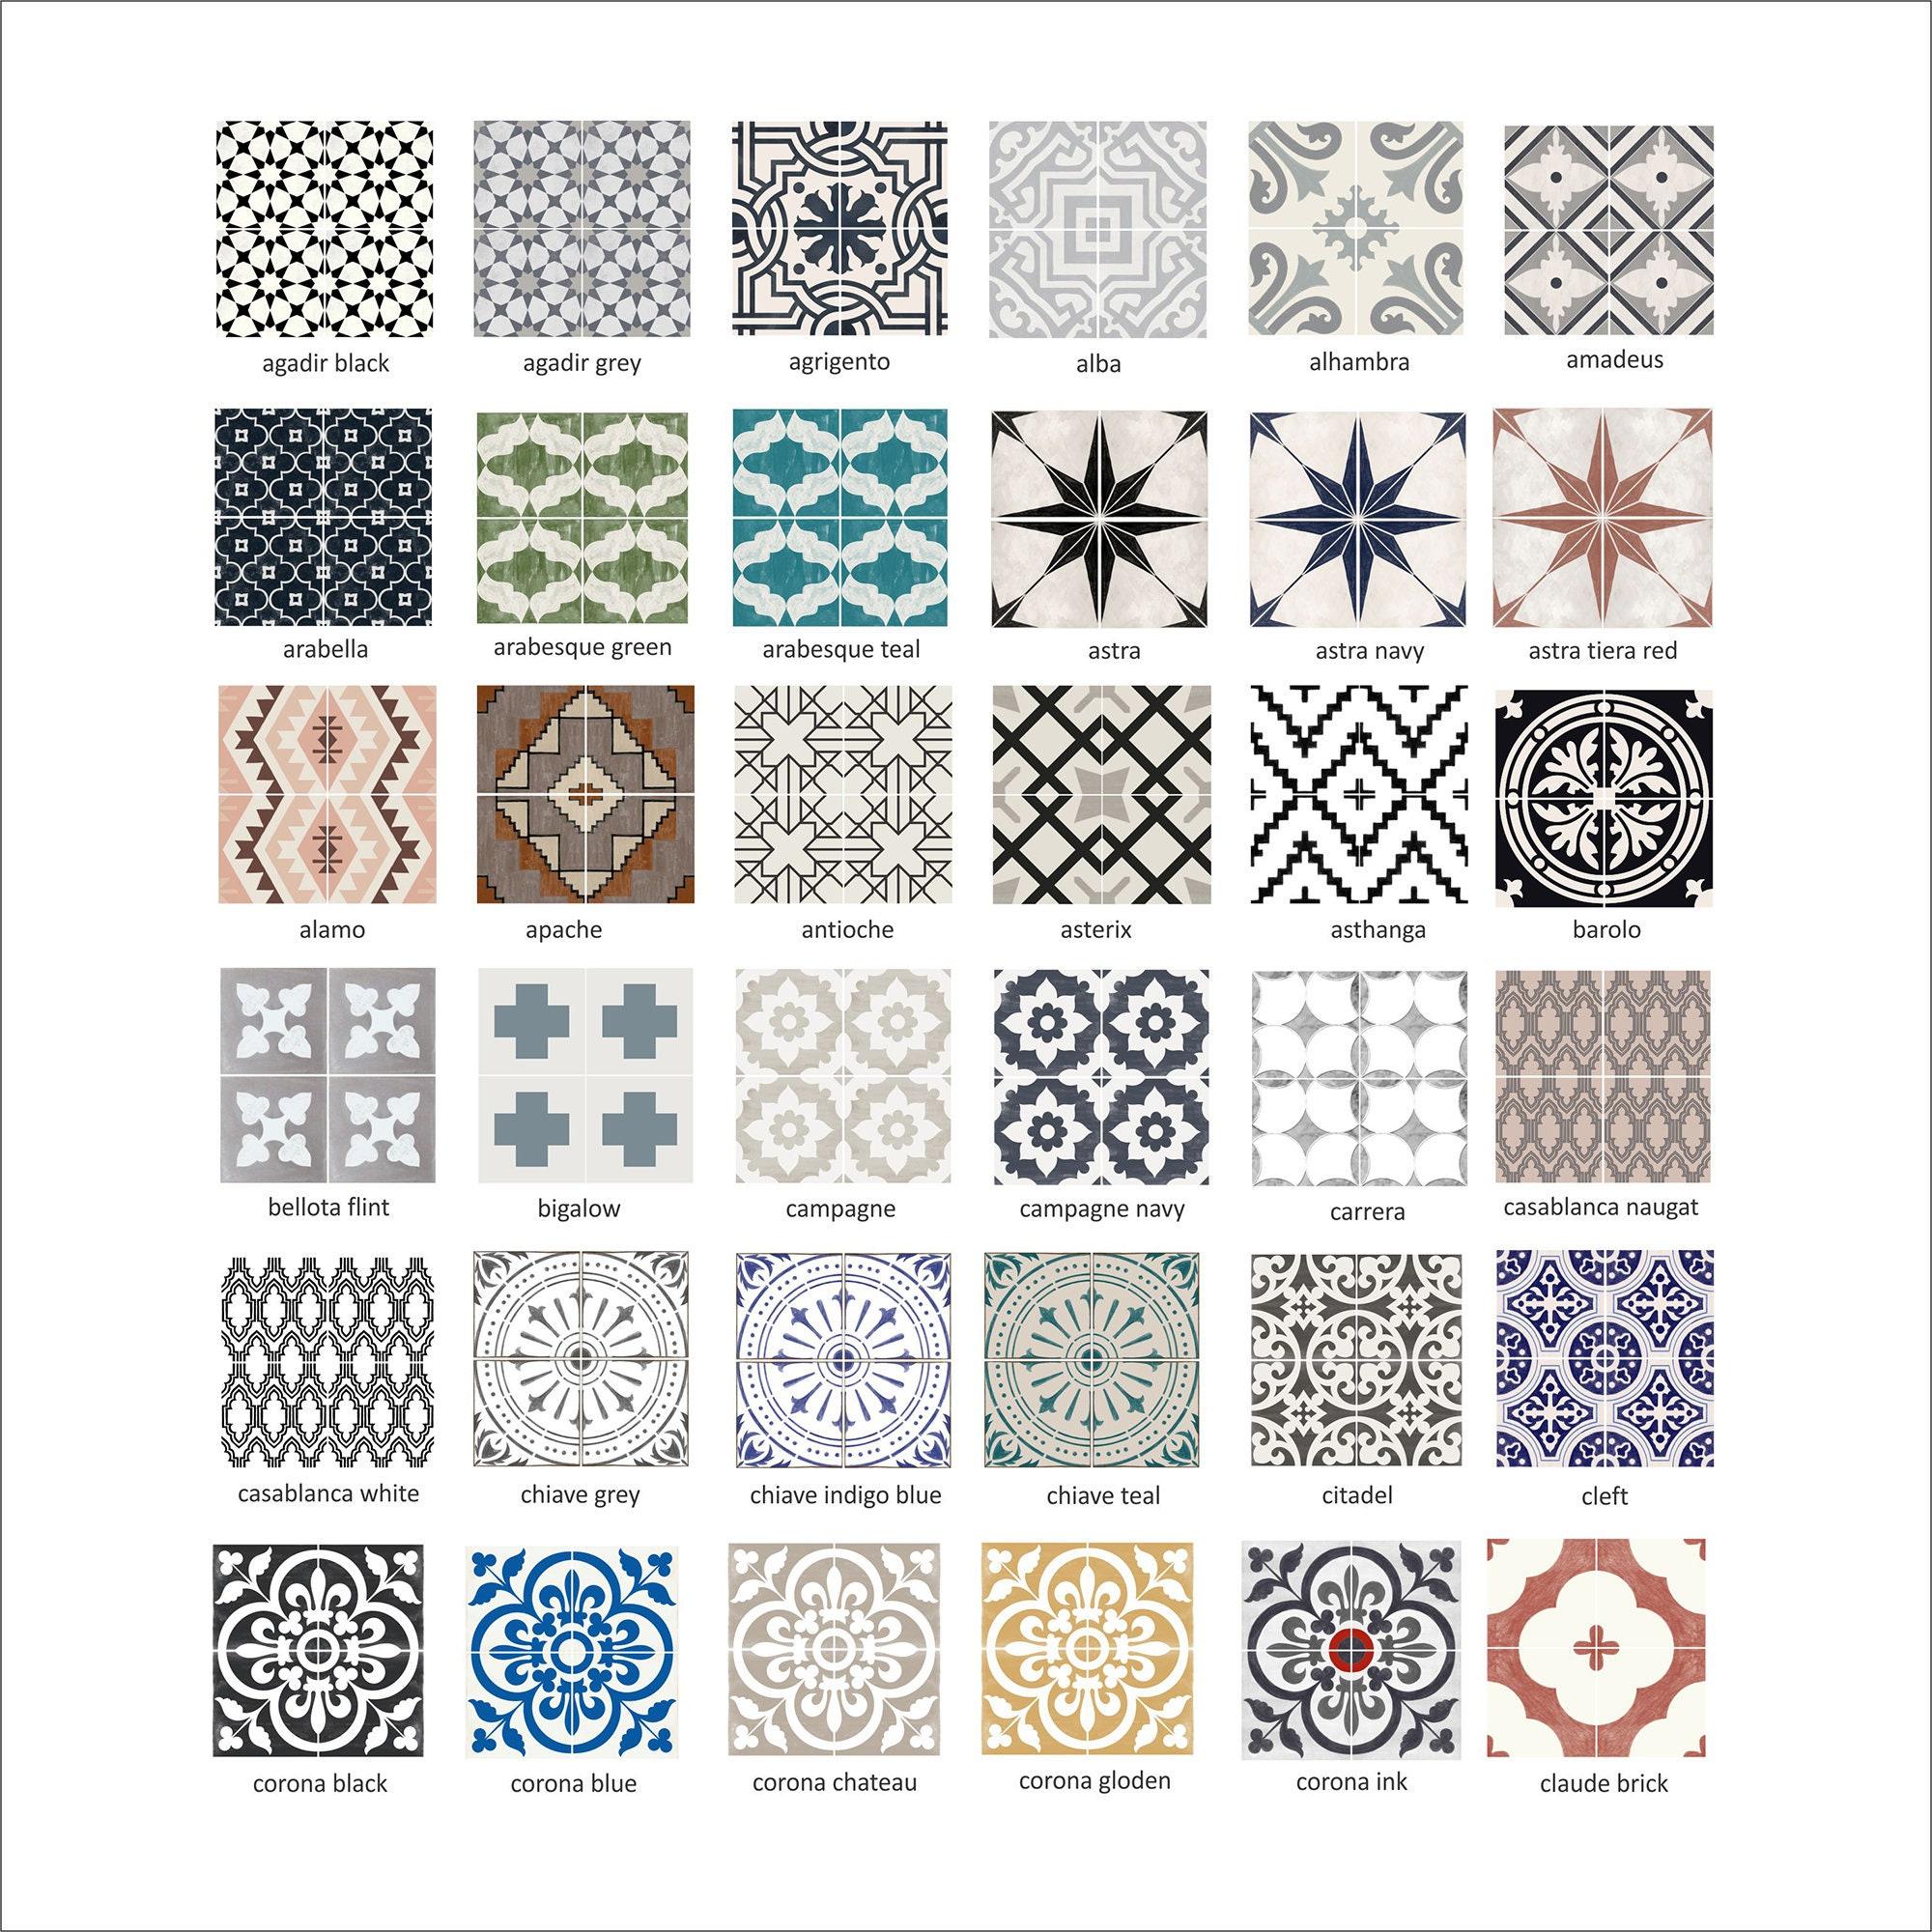 Tile Decals Tiles For Kitchen Bathroom, Tile Decals For Bathroom